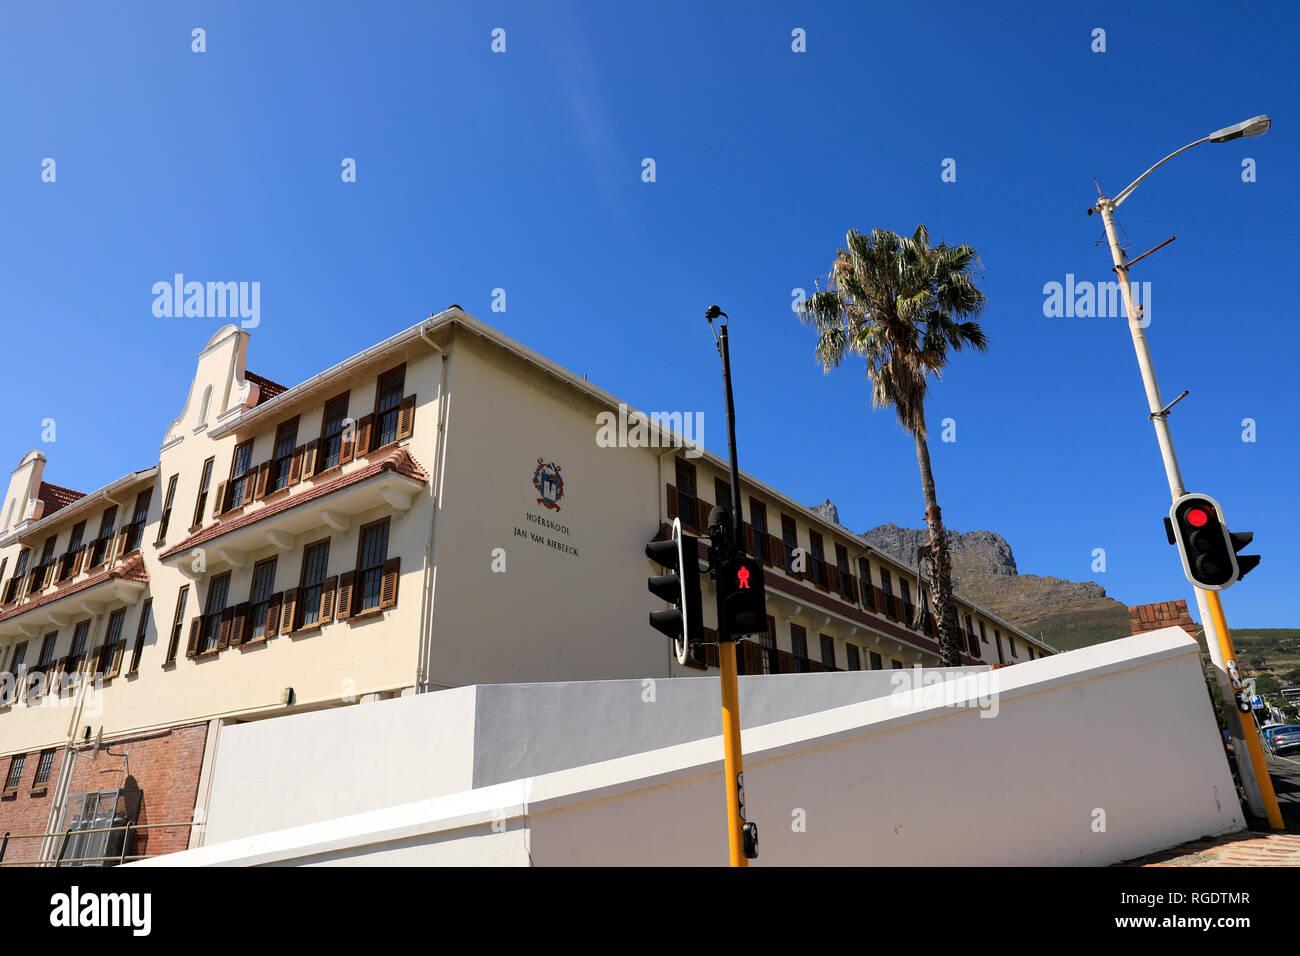 Hoërskool Jan van Riebeeck is an Afrikaans high school (public secondary school) in Kloof Street Cape Town, South Africa. It was founded in 1926.is - Stock Image